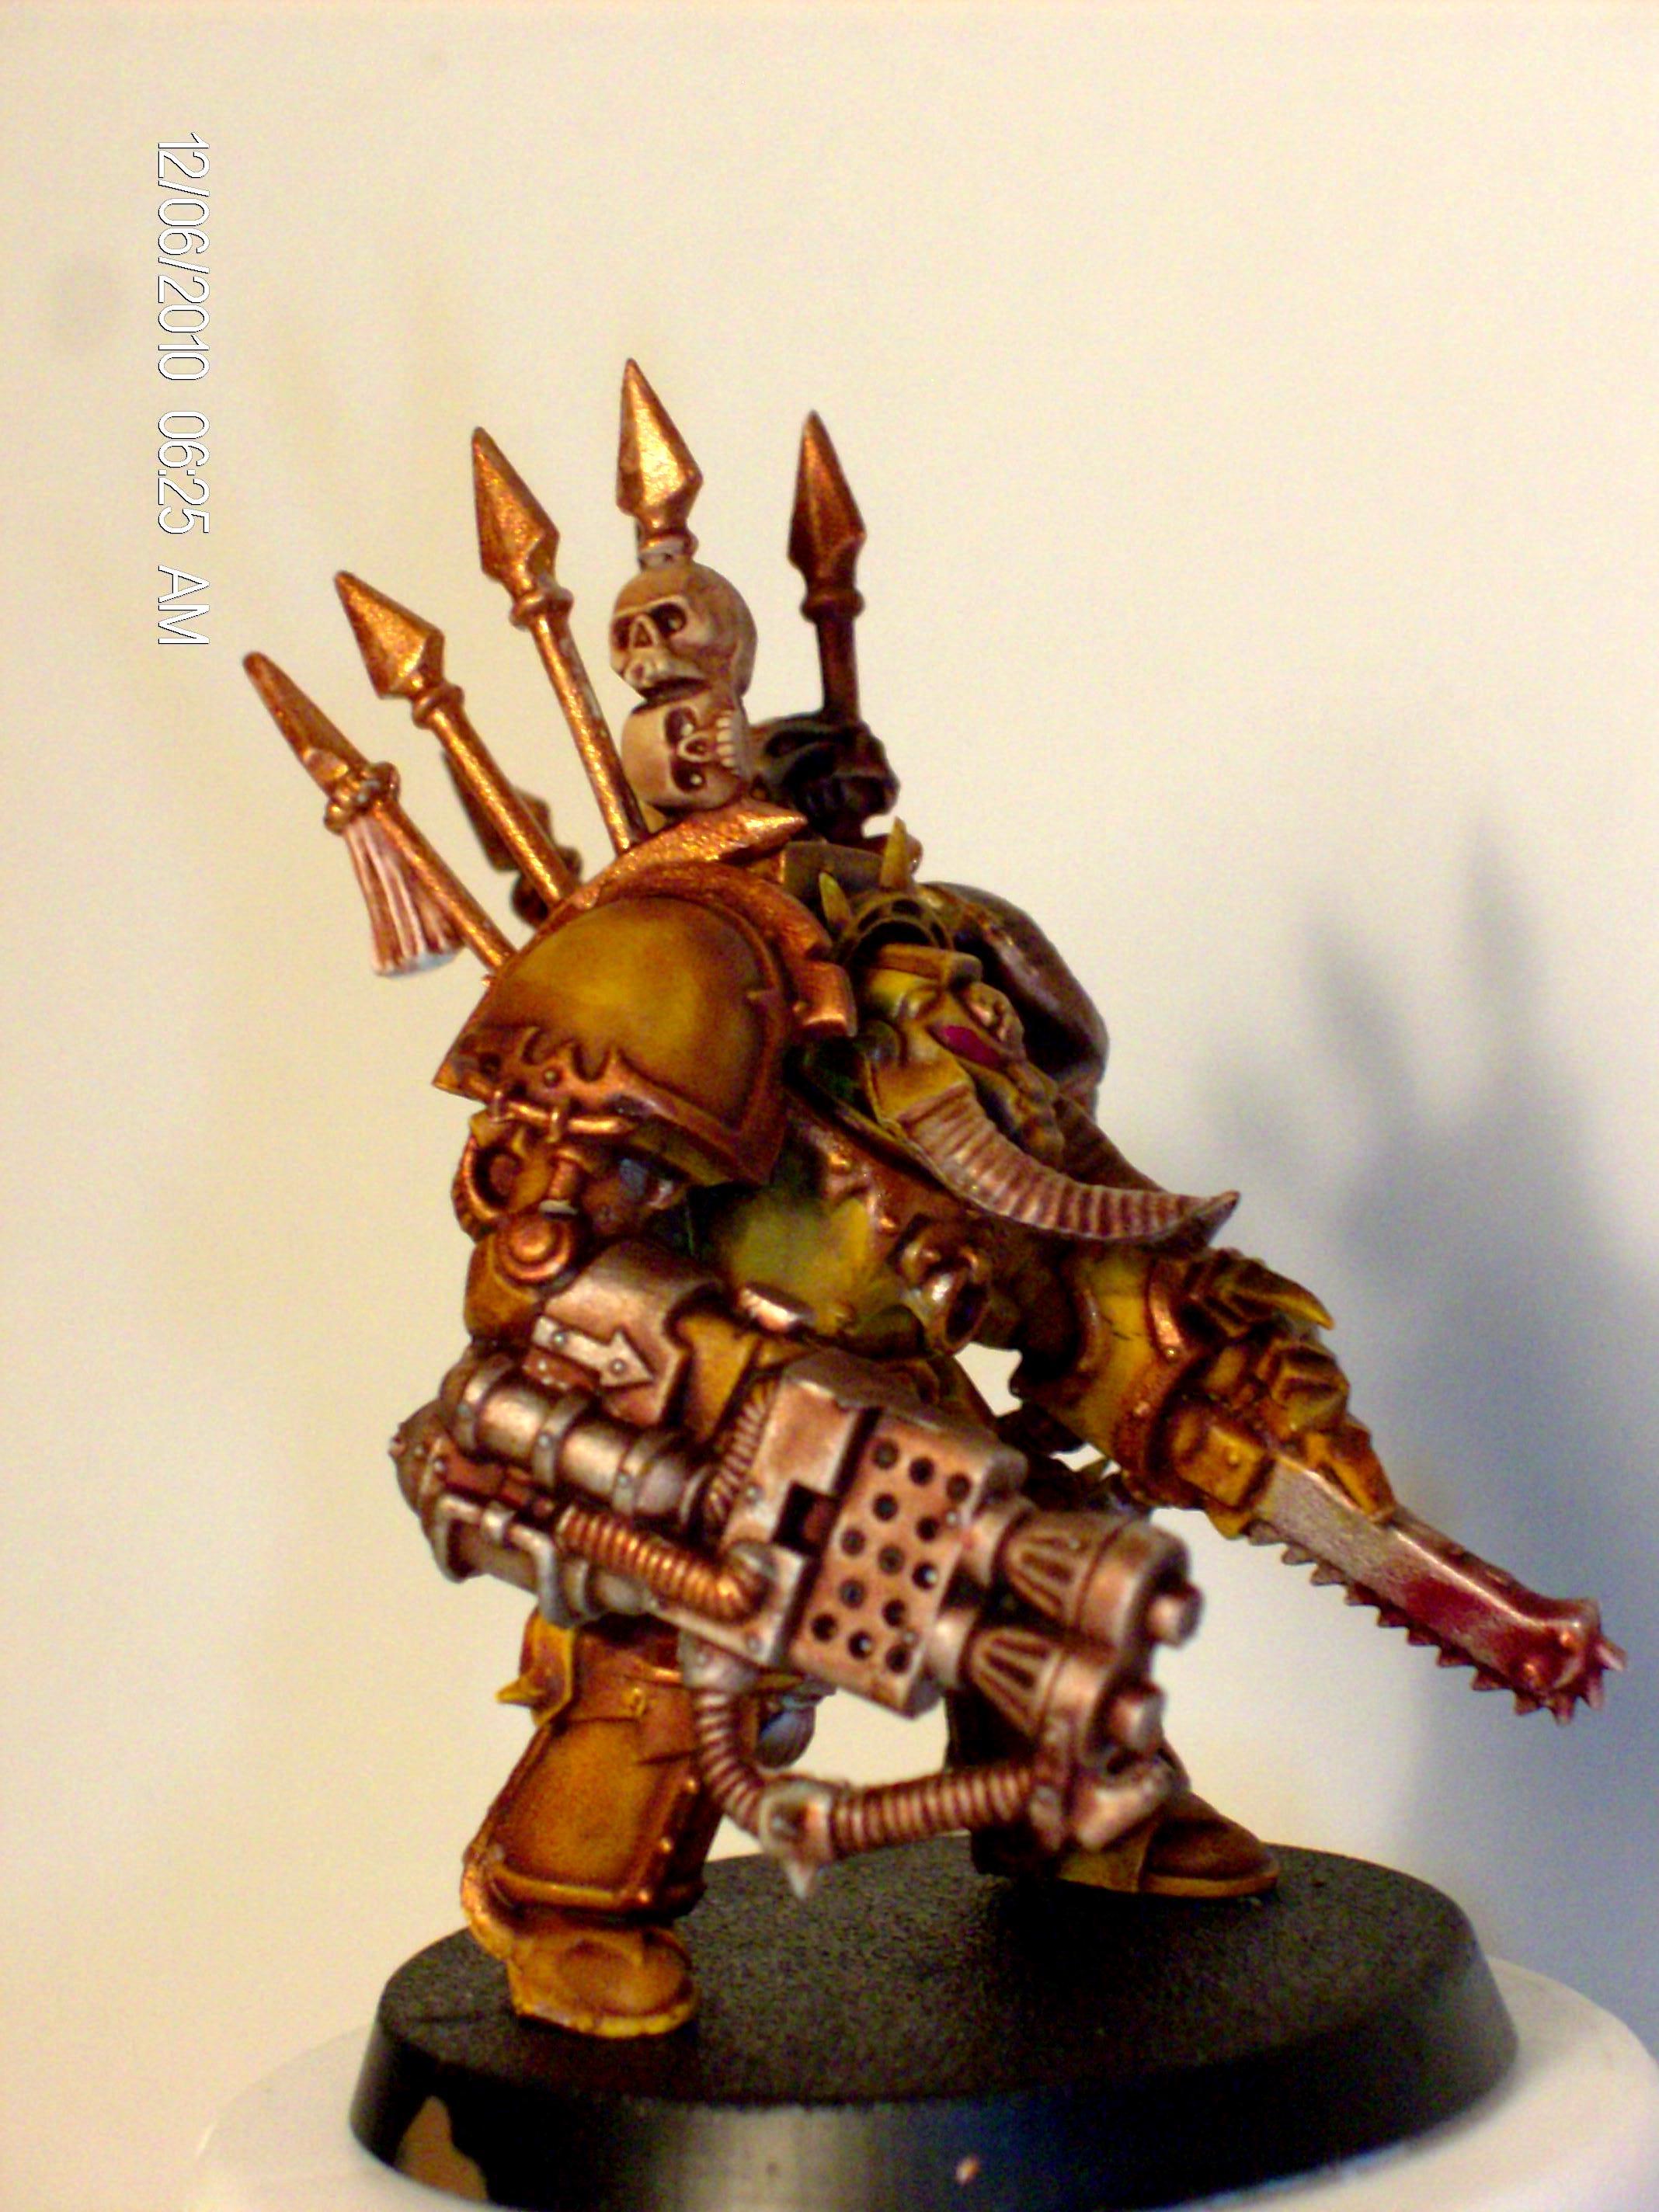 Chainfist, Chaos Space Marines, Heavy Flamer, Terminator Armor